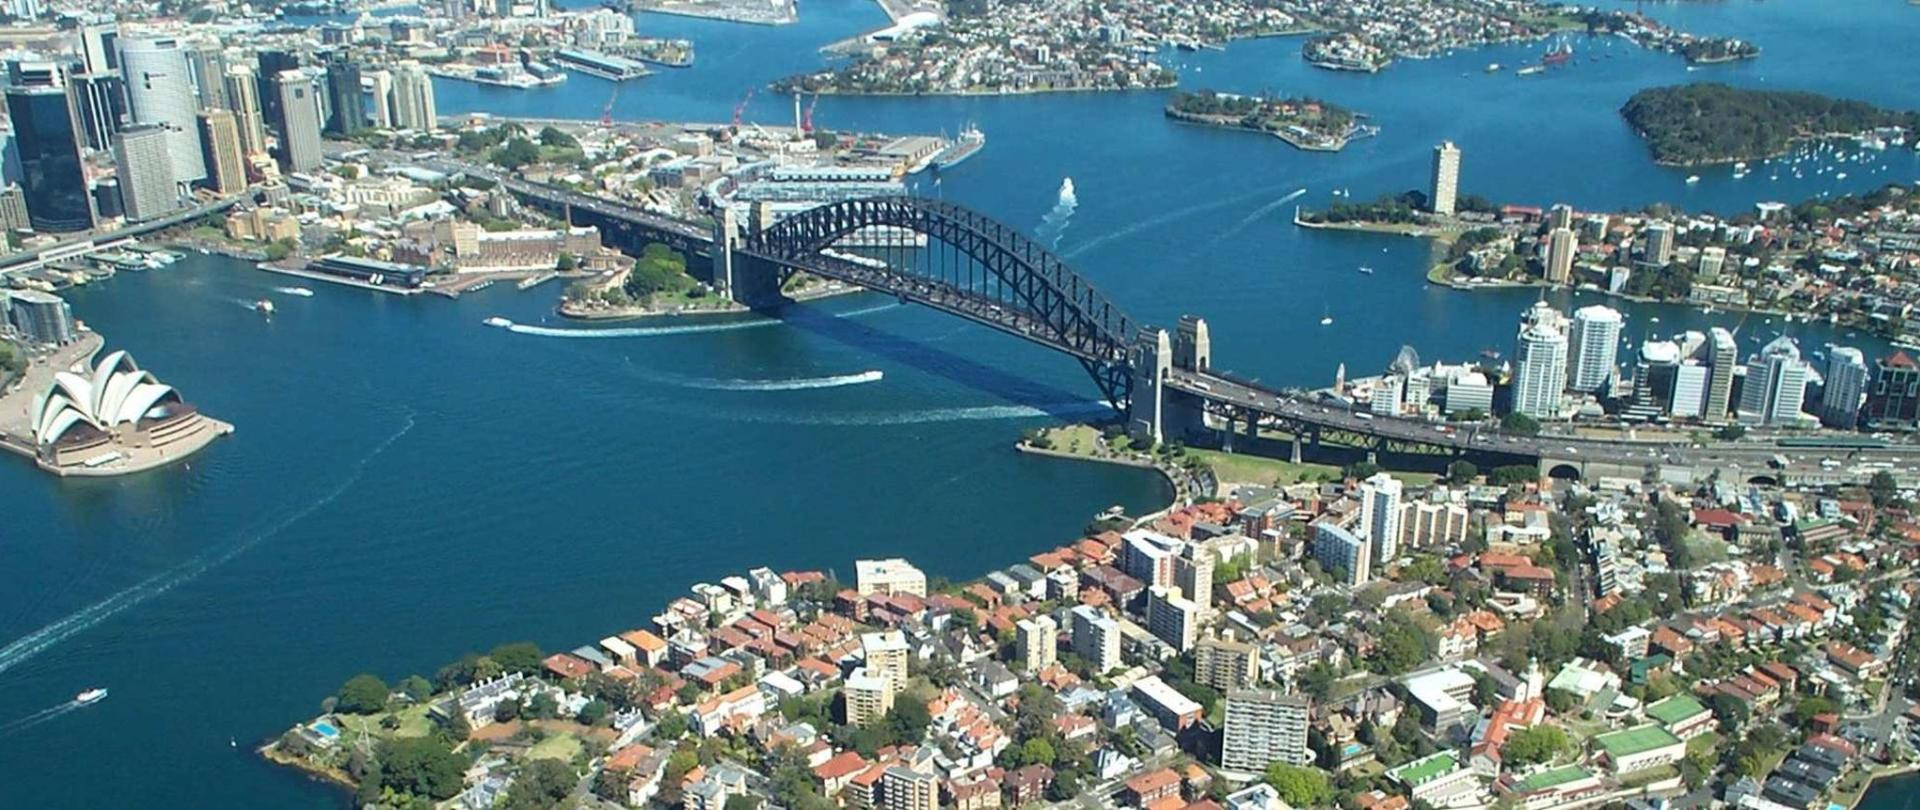 Sydney_Harbour_Bridge.jpg